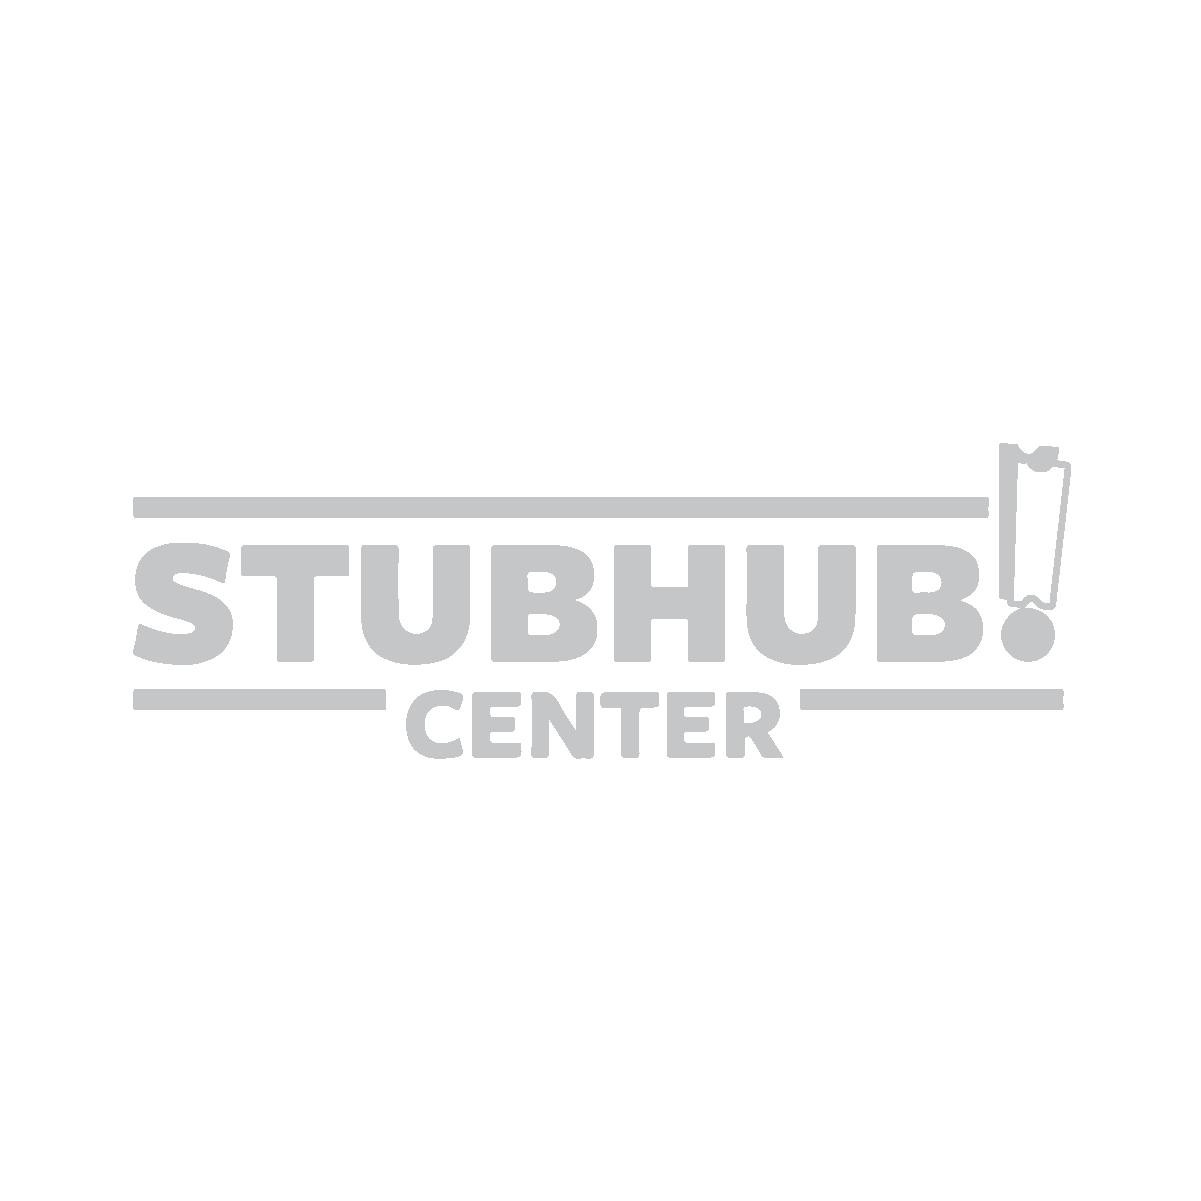 StubHub Center.png